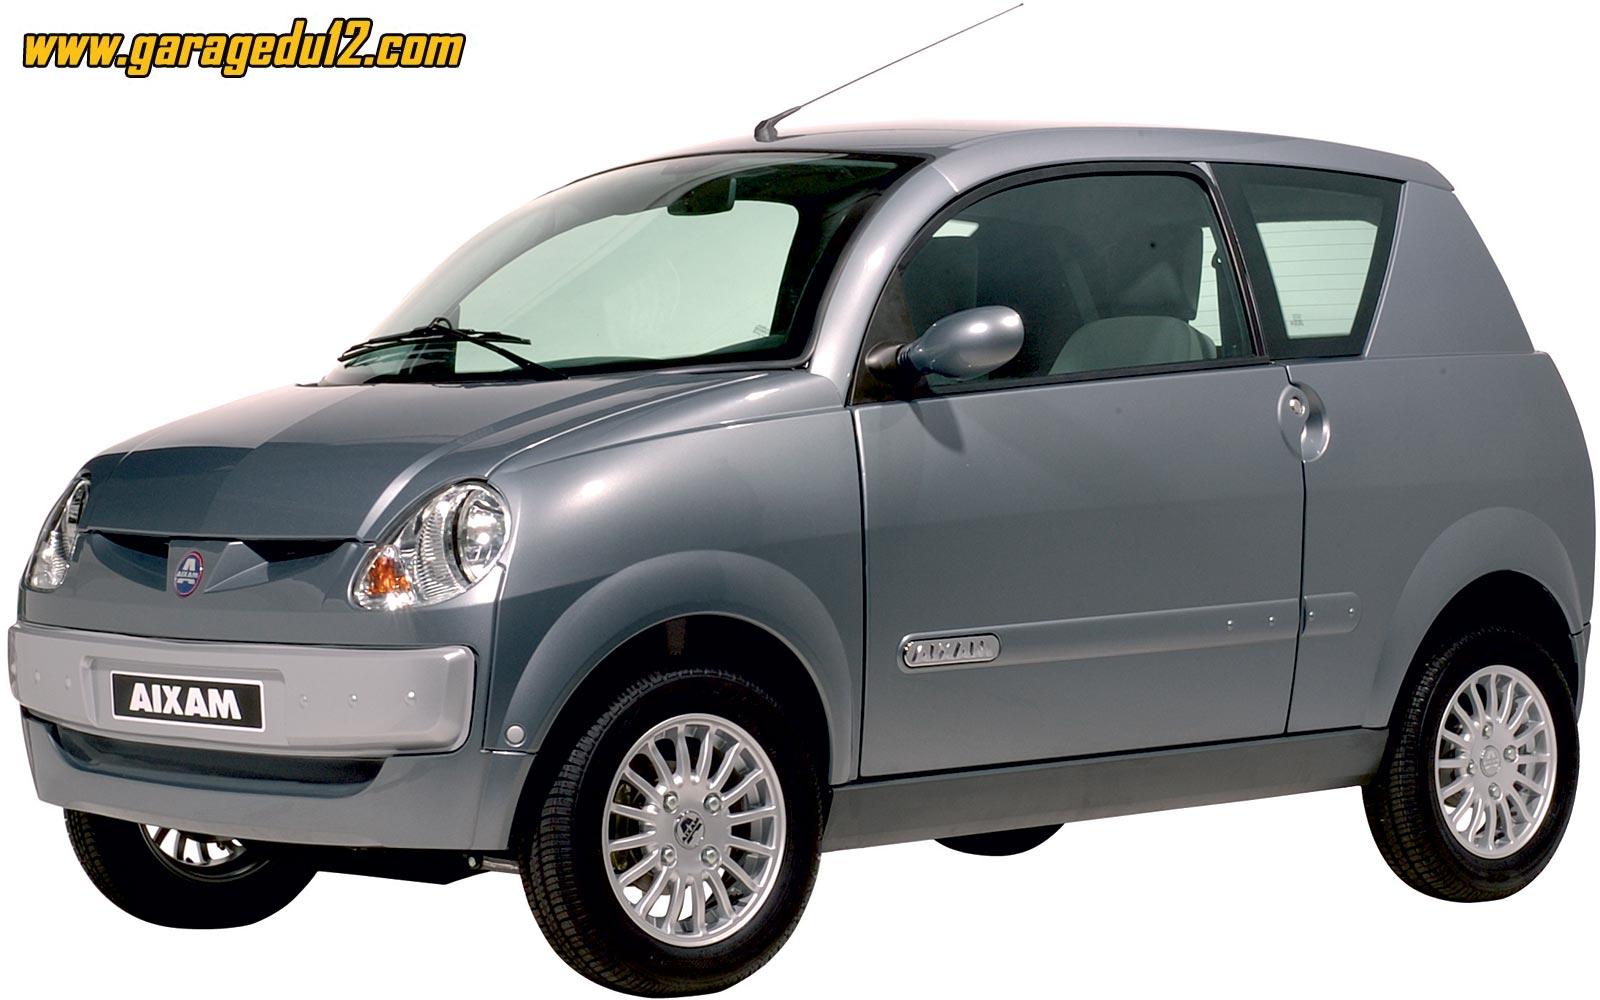 Verwonderlijk Aixam A741:picture # 6 , reviews, news, specs, buy car AC-58